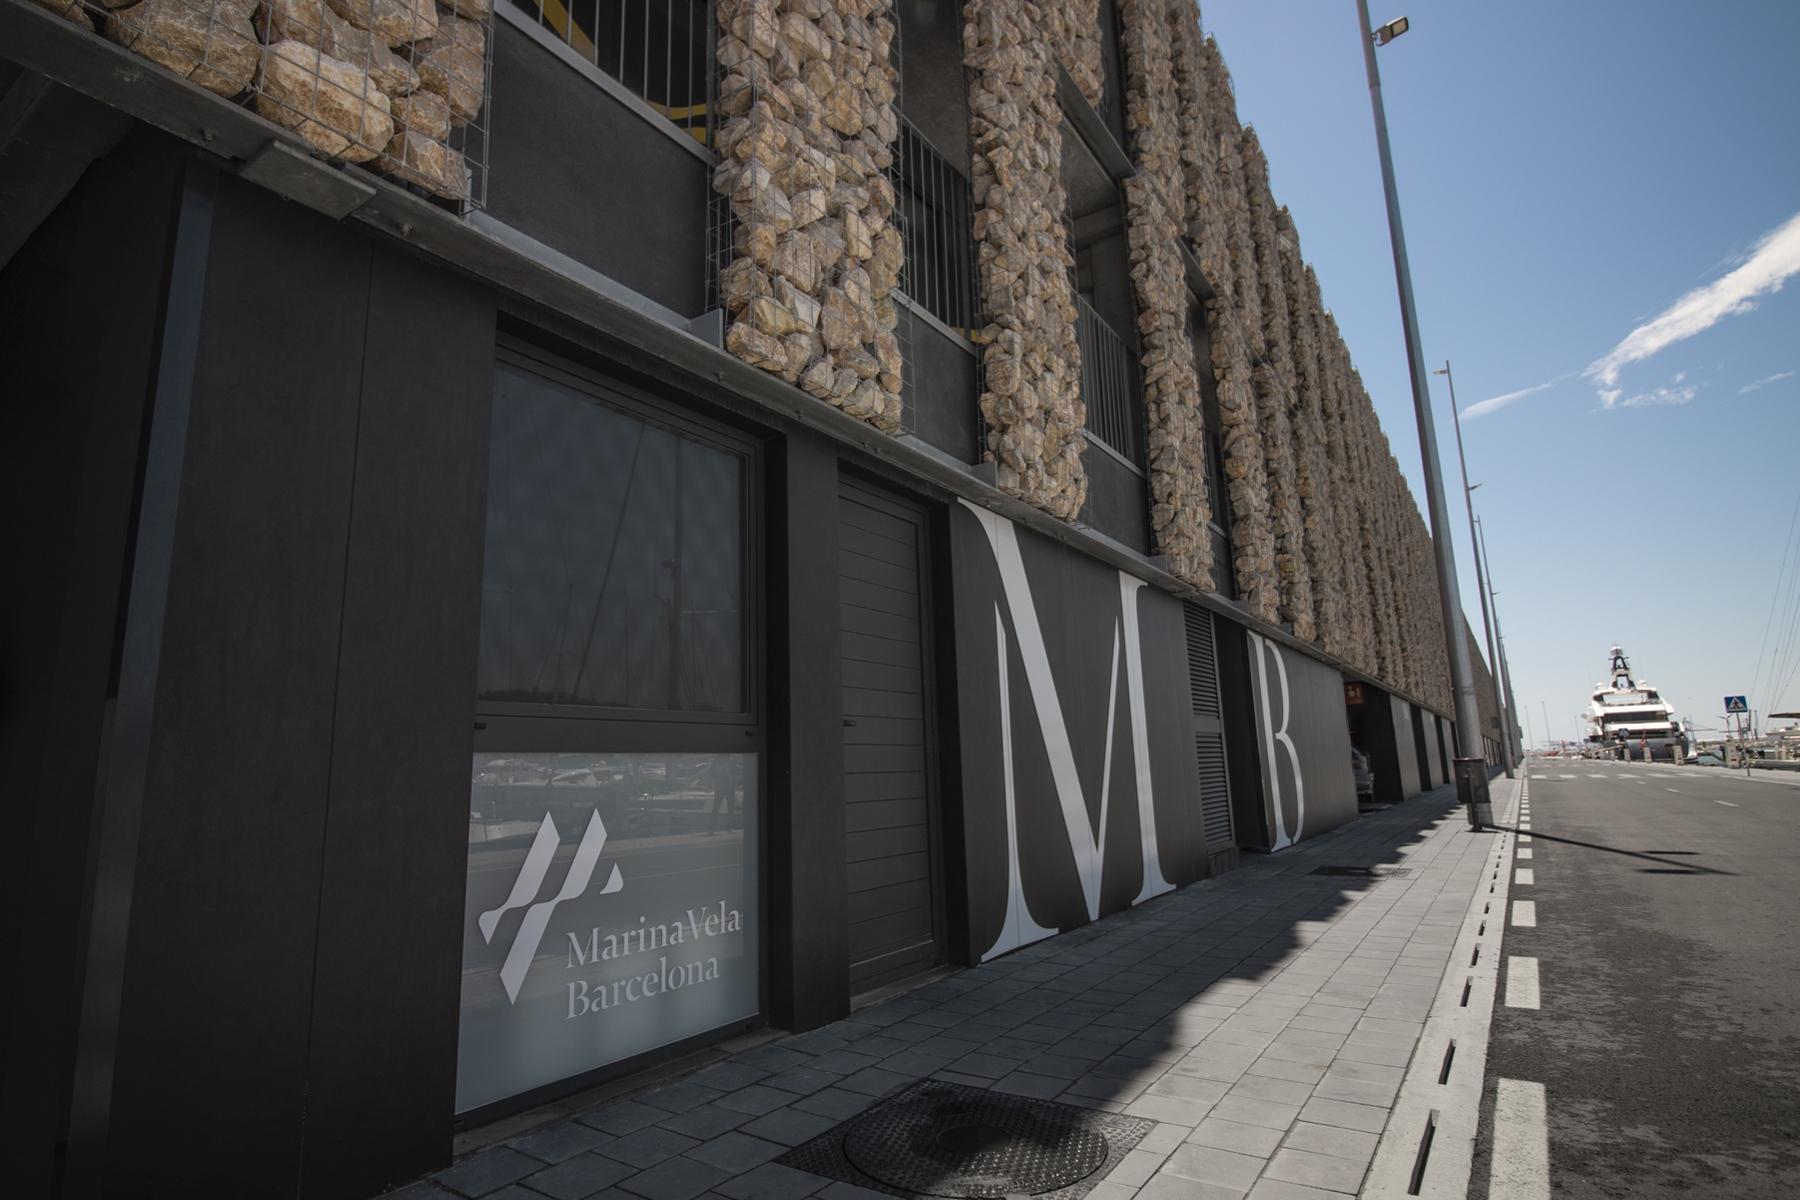 50-Inalco-en-Marina-Vela-Barcelona